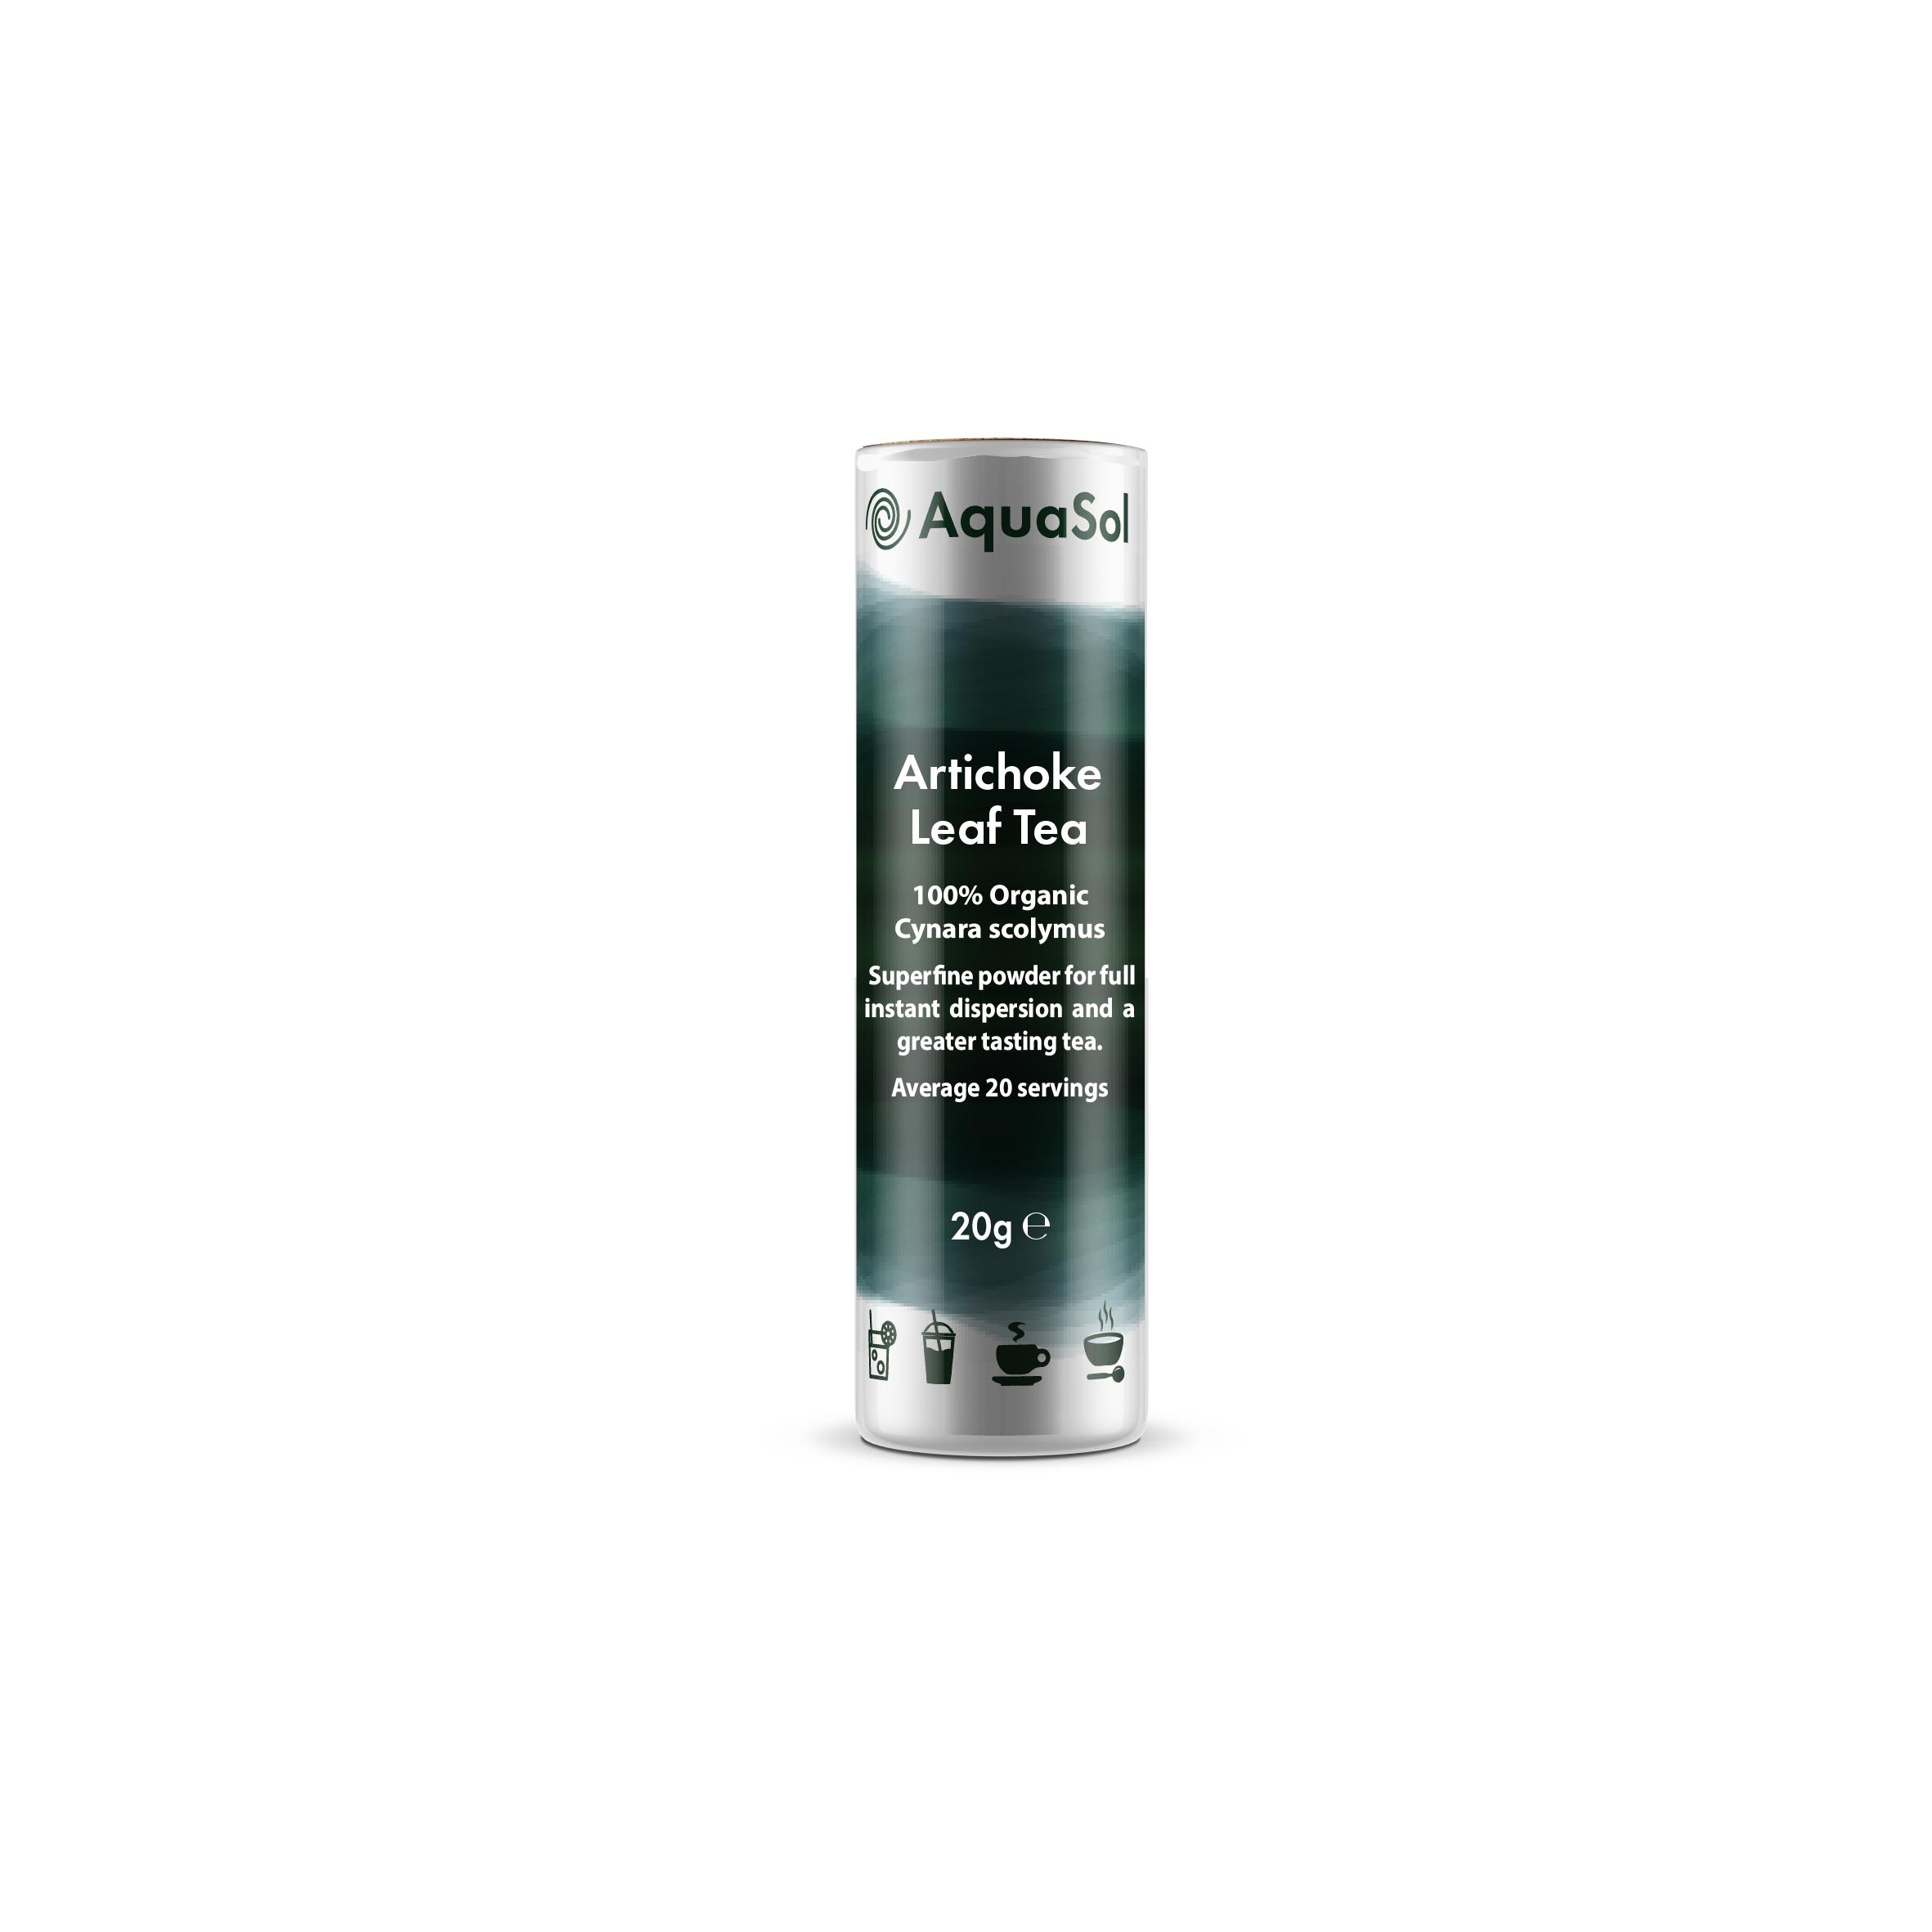 Artichoke Leaf Tea 100% Organic 20g